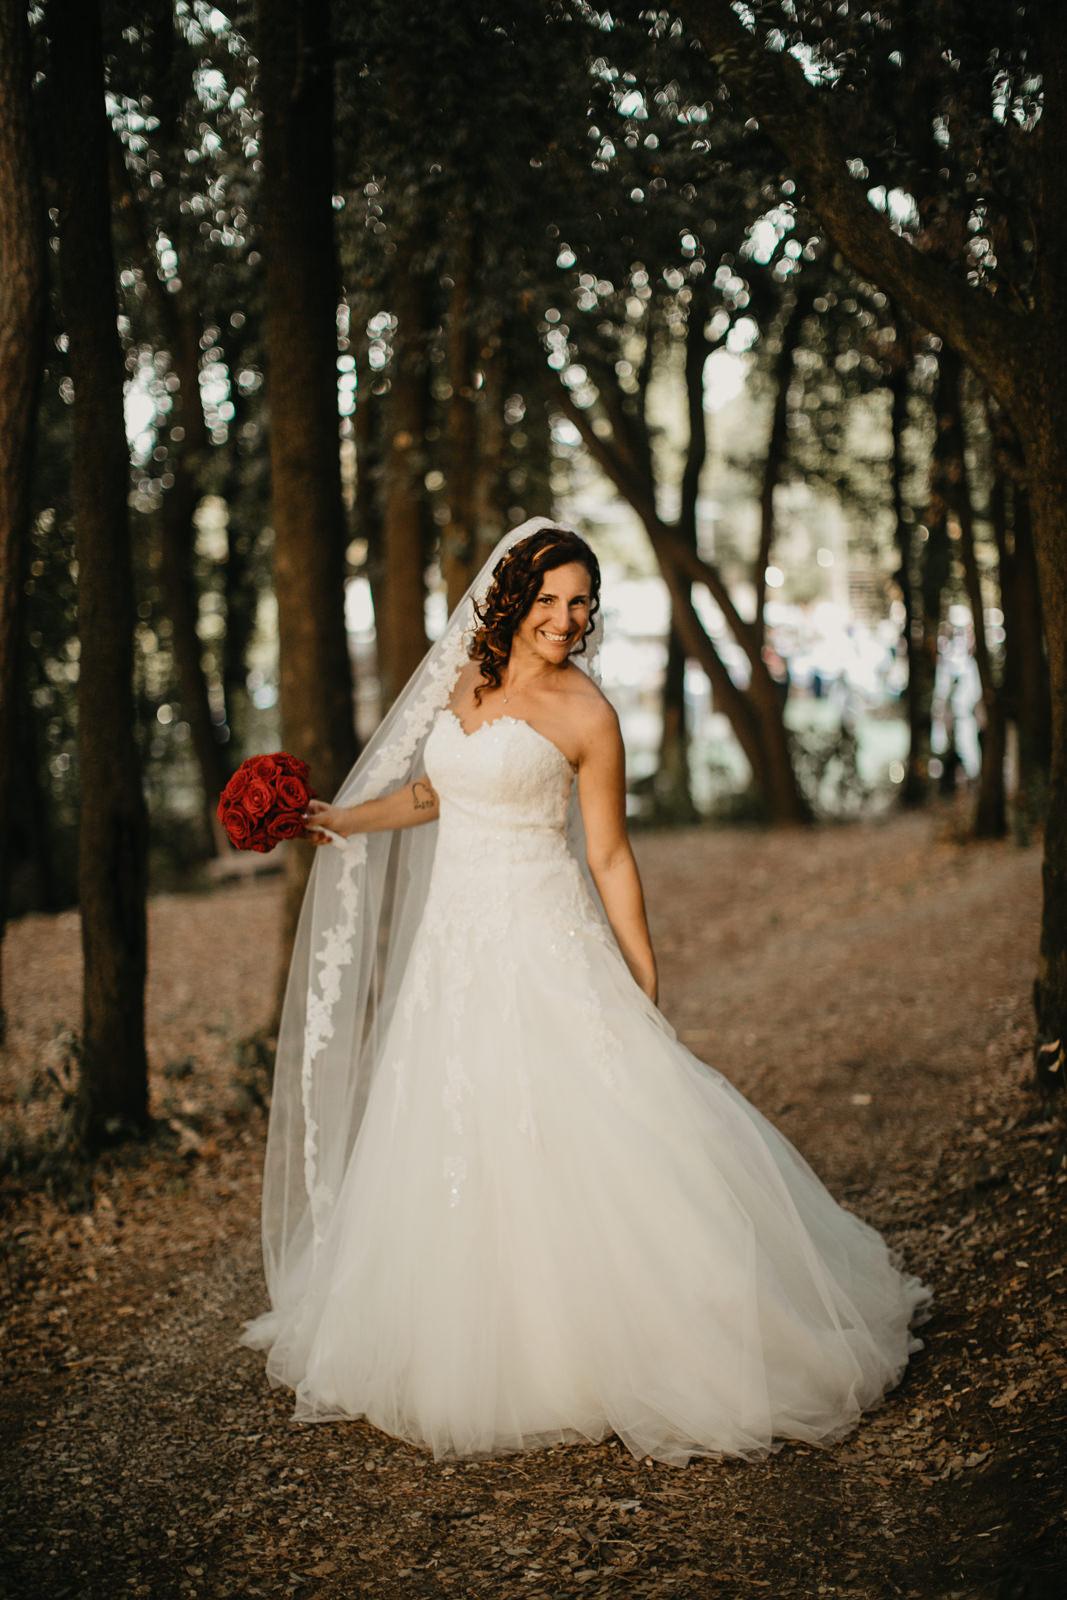 Best Wedding Photographers - Destination weddings -  Pat Cori Photography-29.jpg